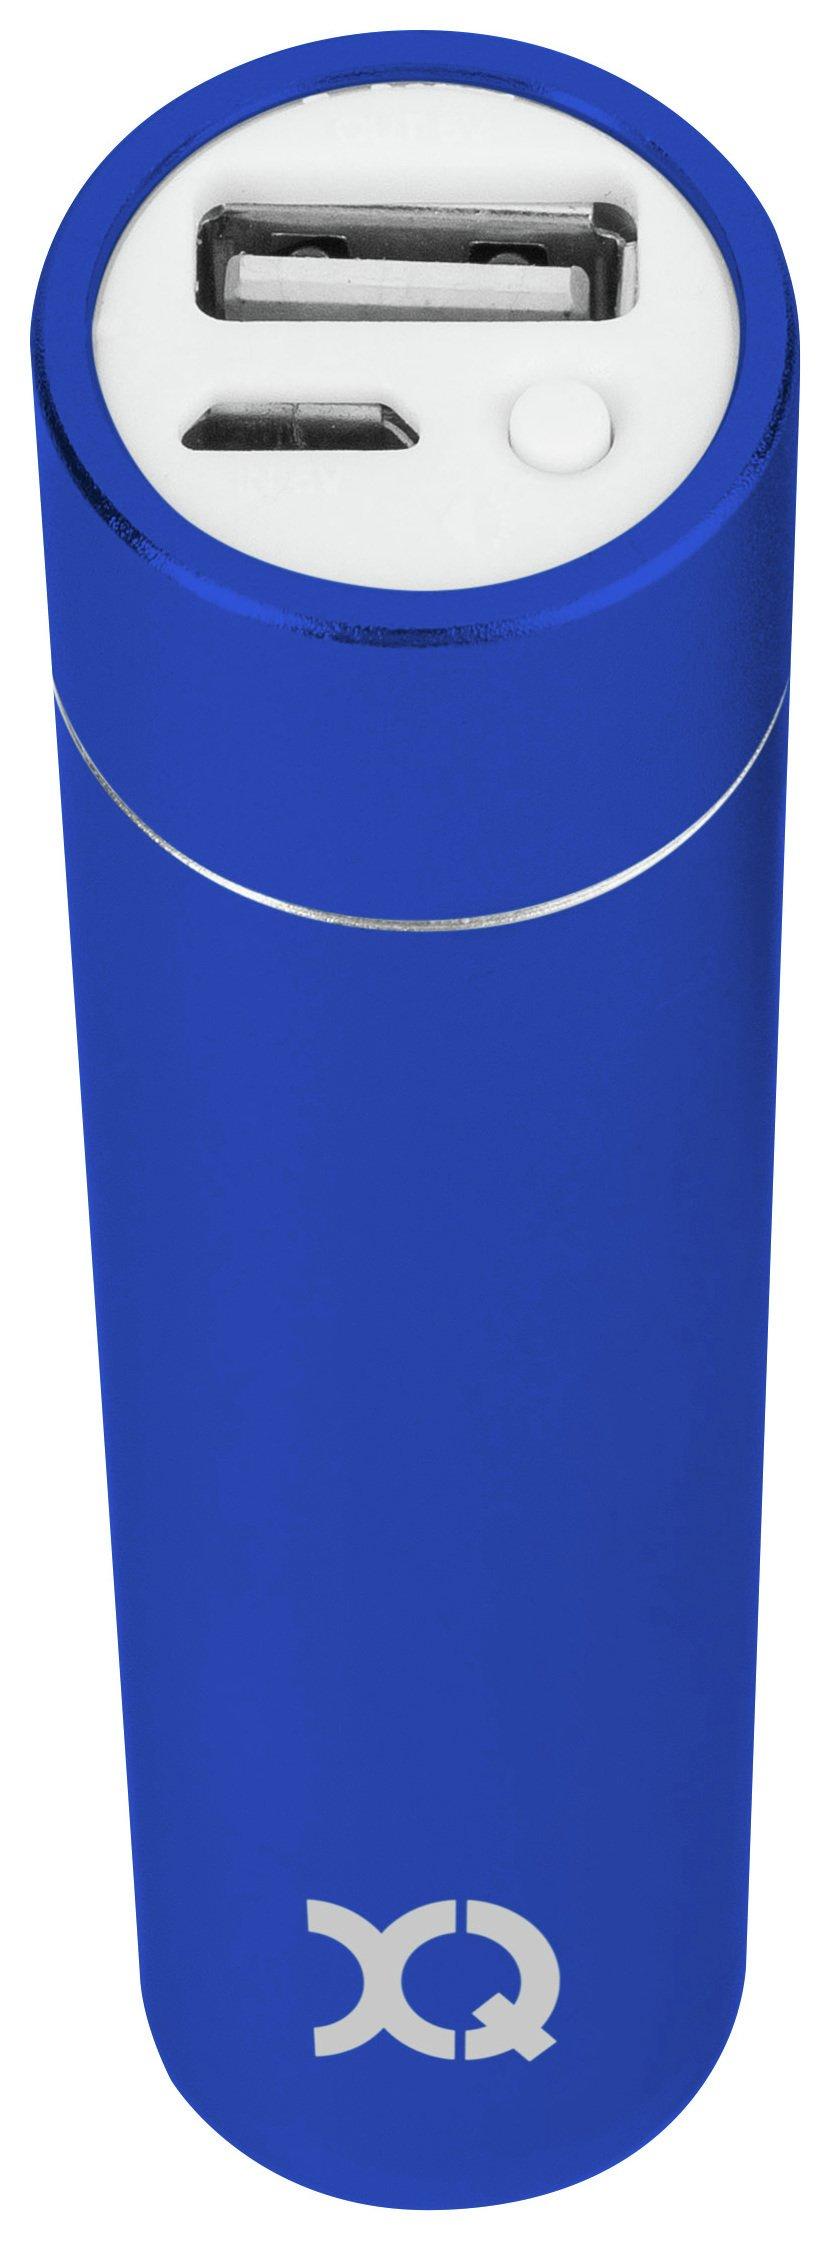 Xqisit Xqisit 2600mAh Powerbank - Blue.